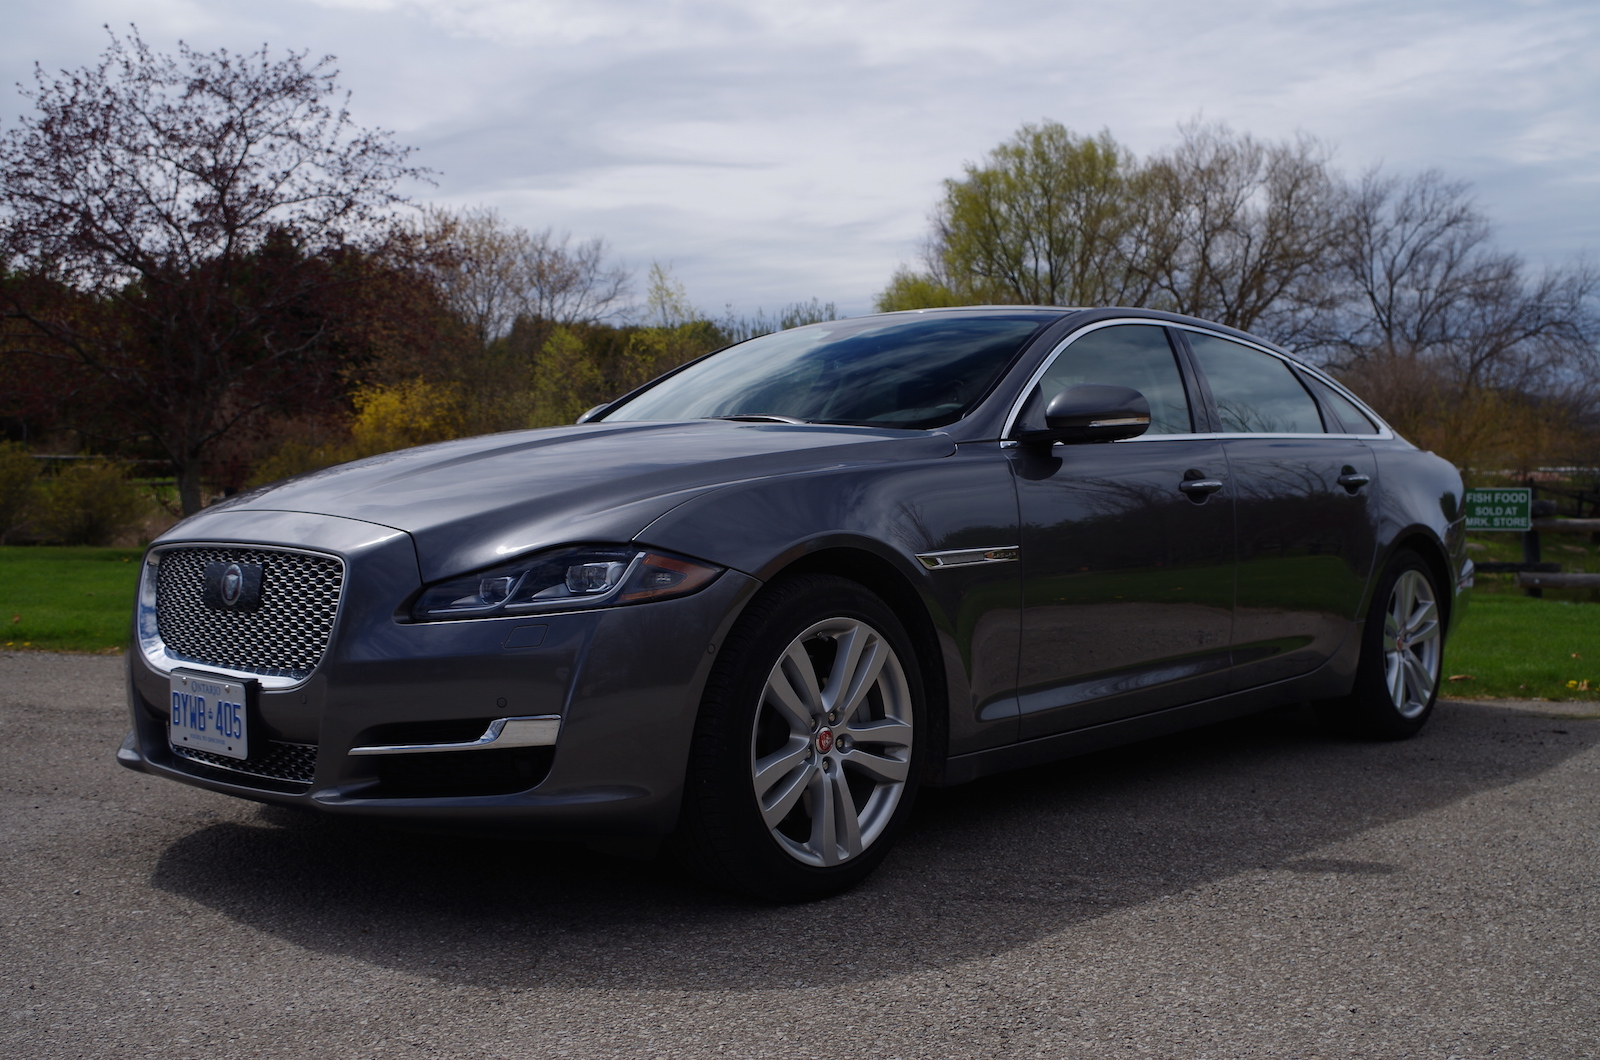 Review 2016 Jaguar Xjl Portfolio Awd Canadian Auto Review